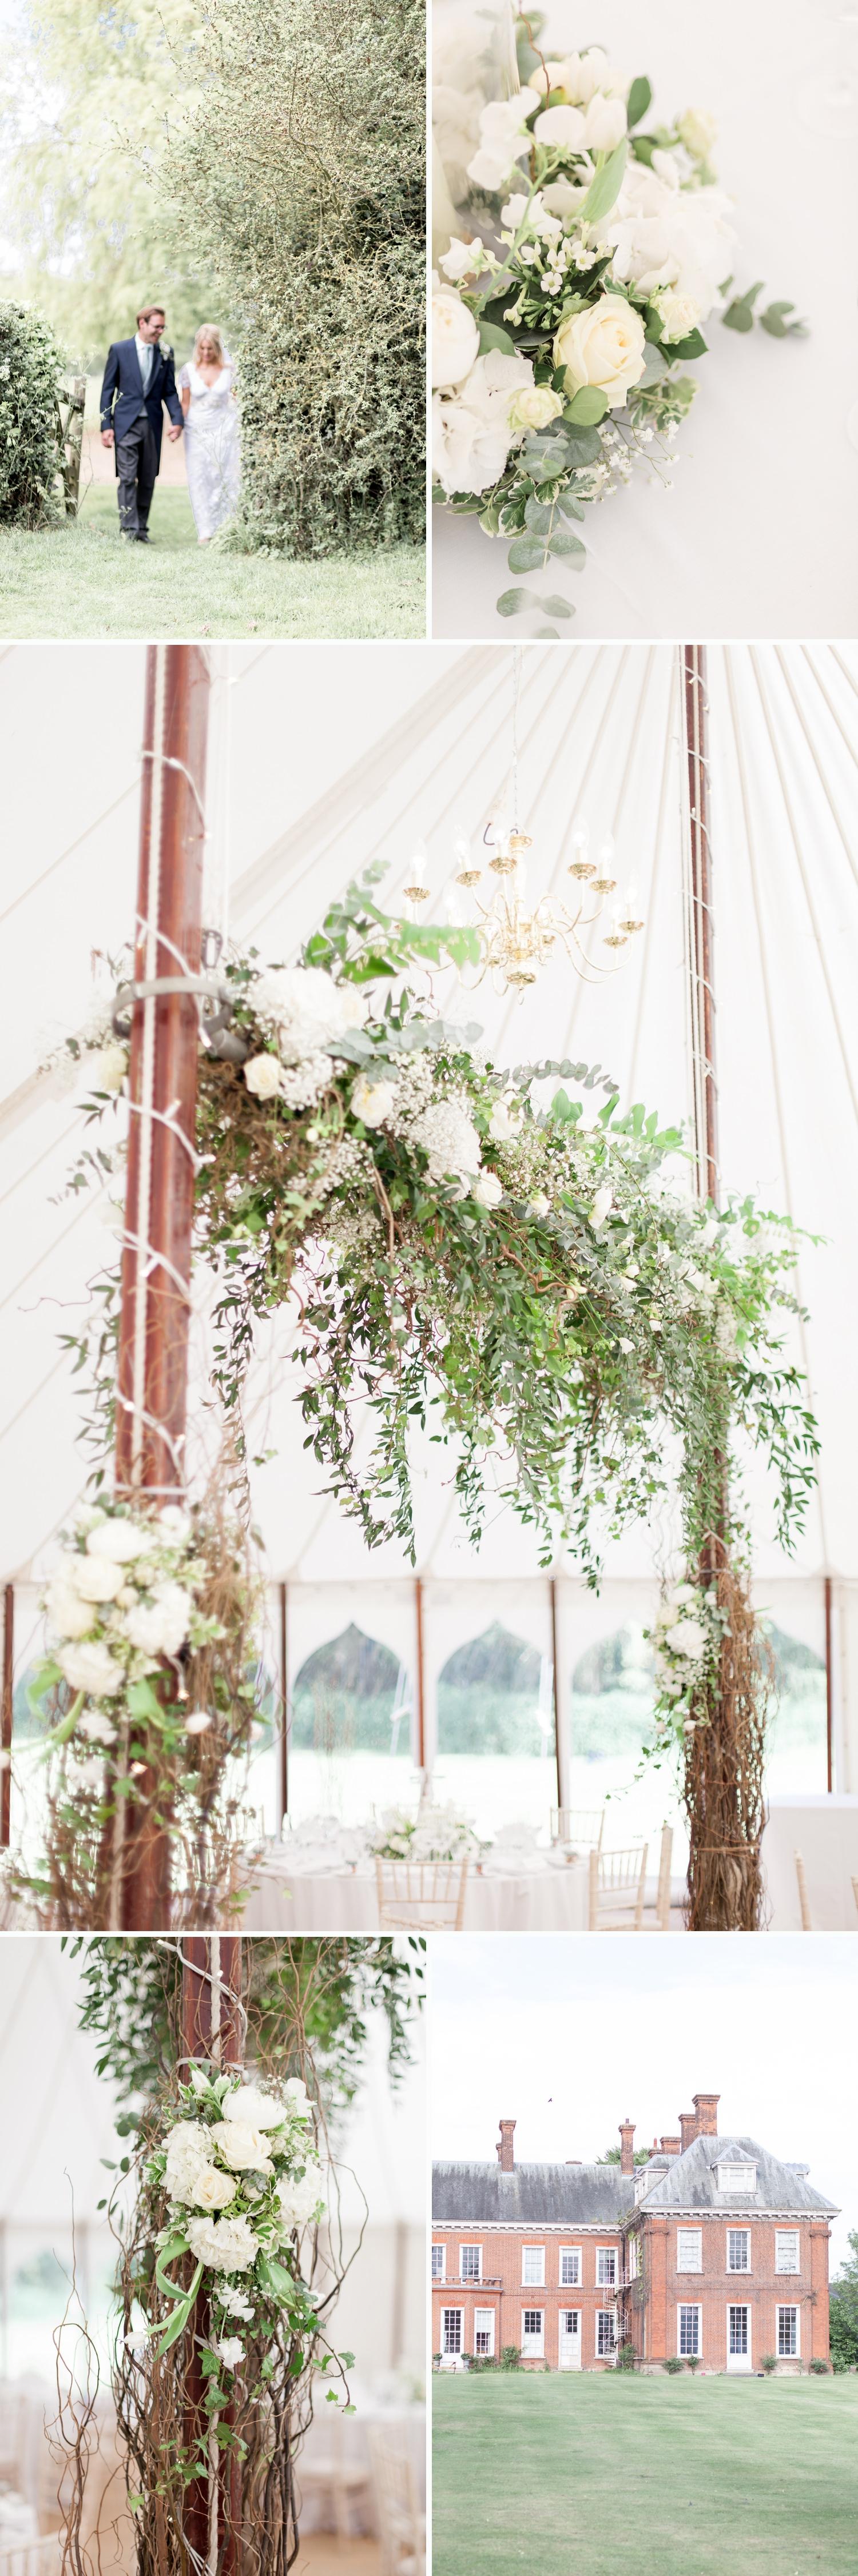 Emily & Jonathan's Cambridgeshire wedding - details from a Fine Art wedding